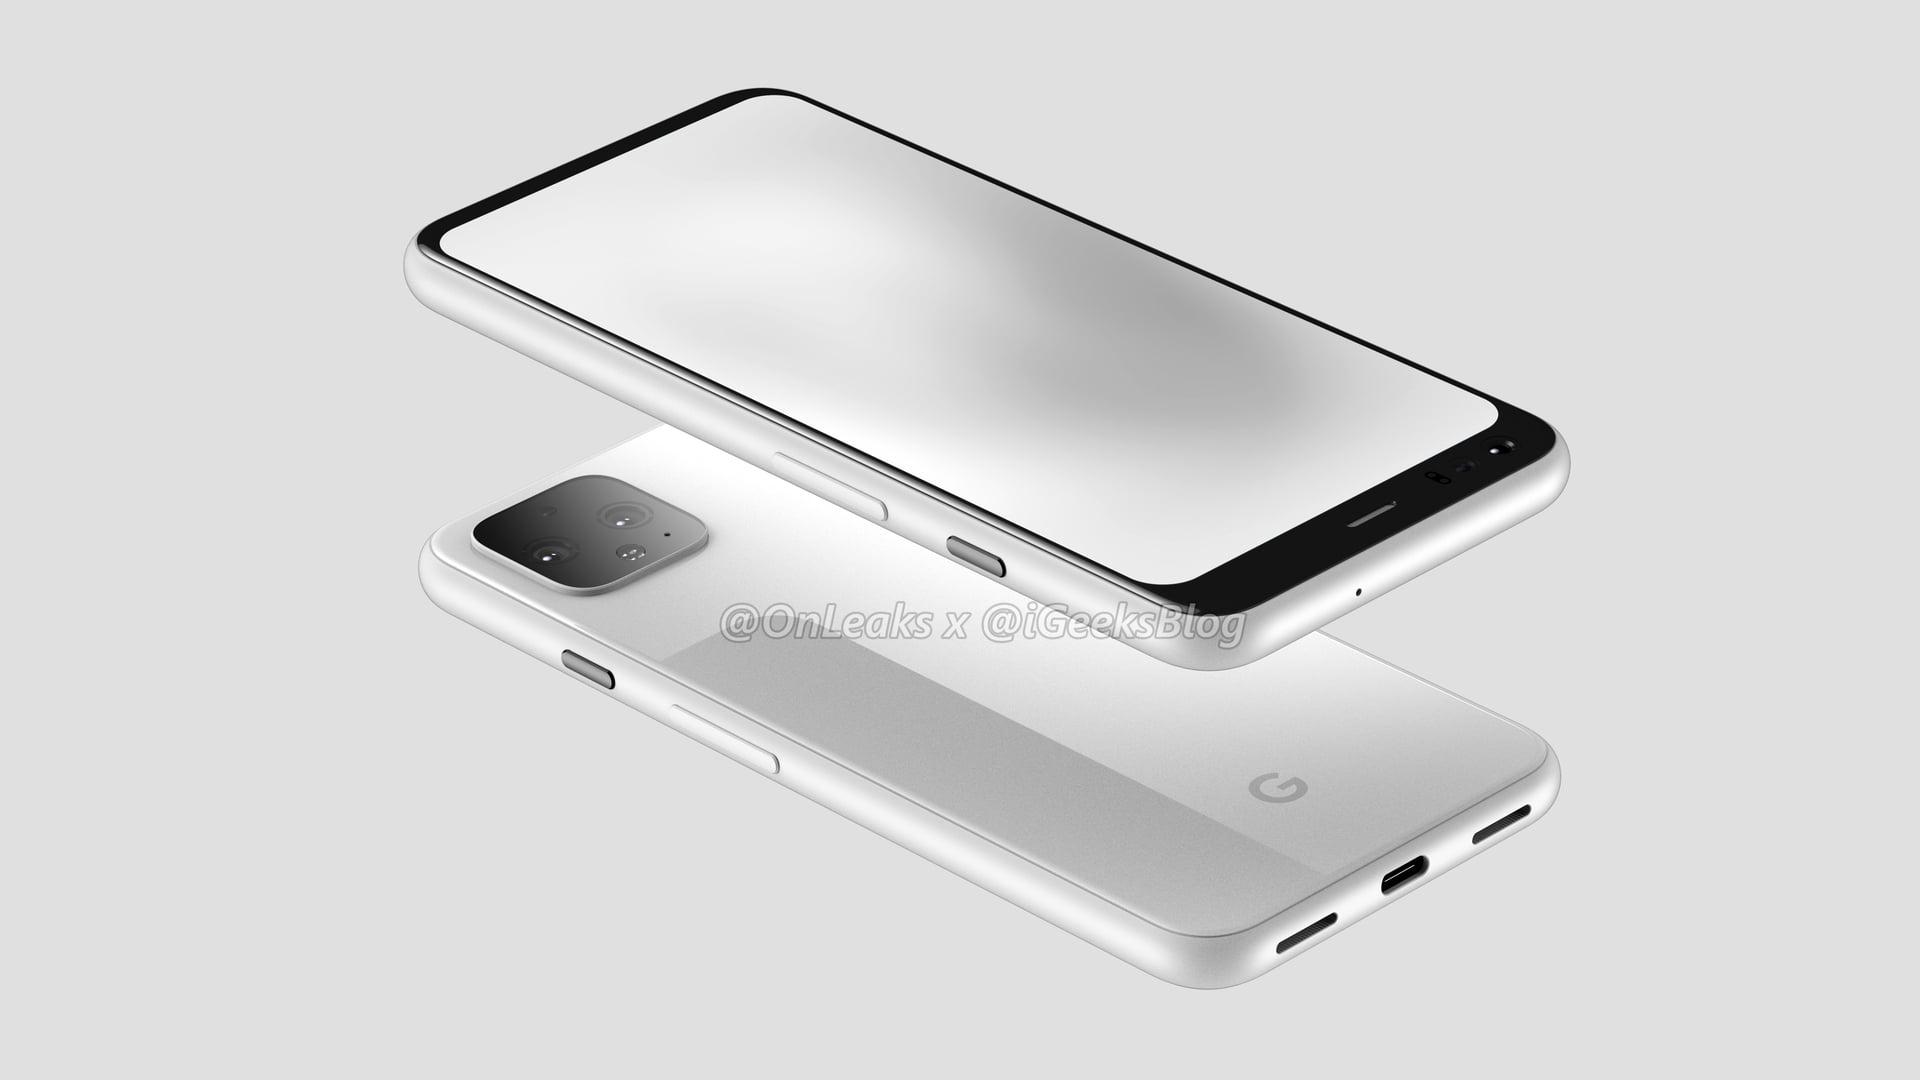 سنسورهای مرموز گوگل پیکسل 4